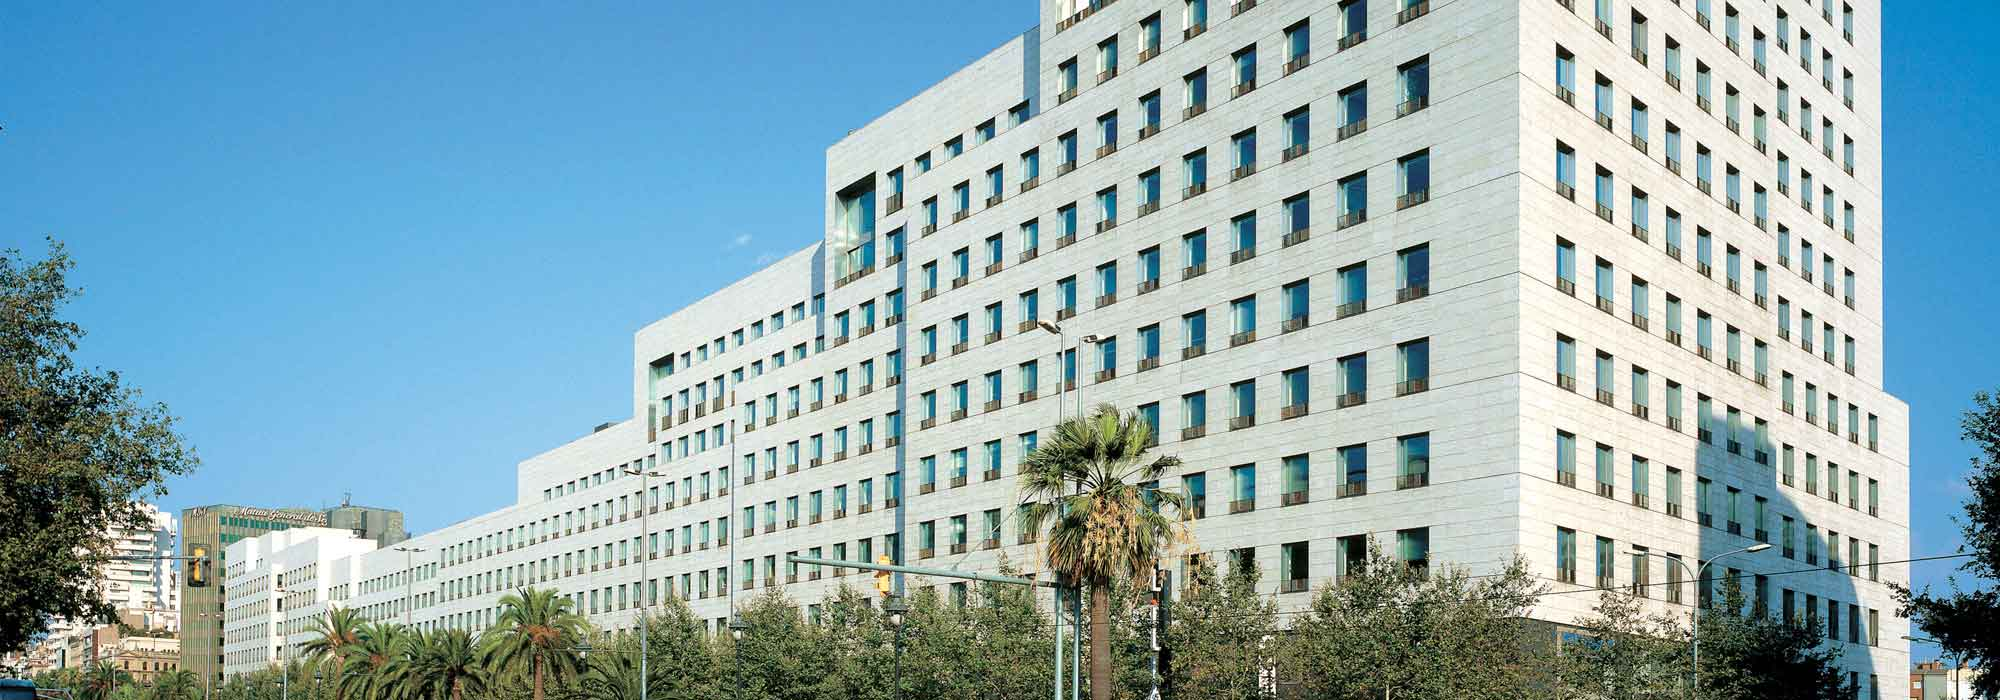 Pisos-nuevos-Barcelona-Gracia-comercial-Illa-Diagonal